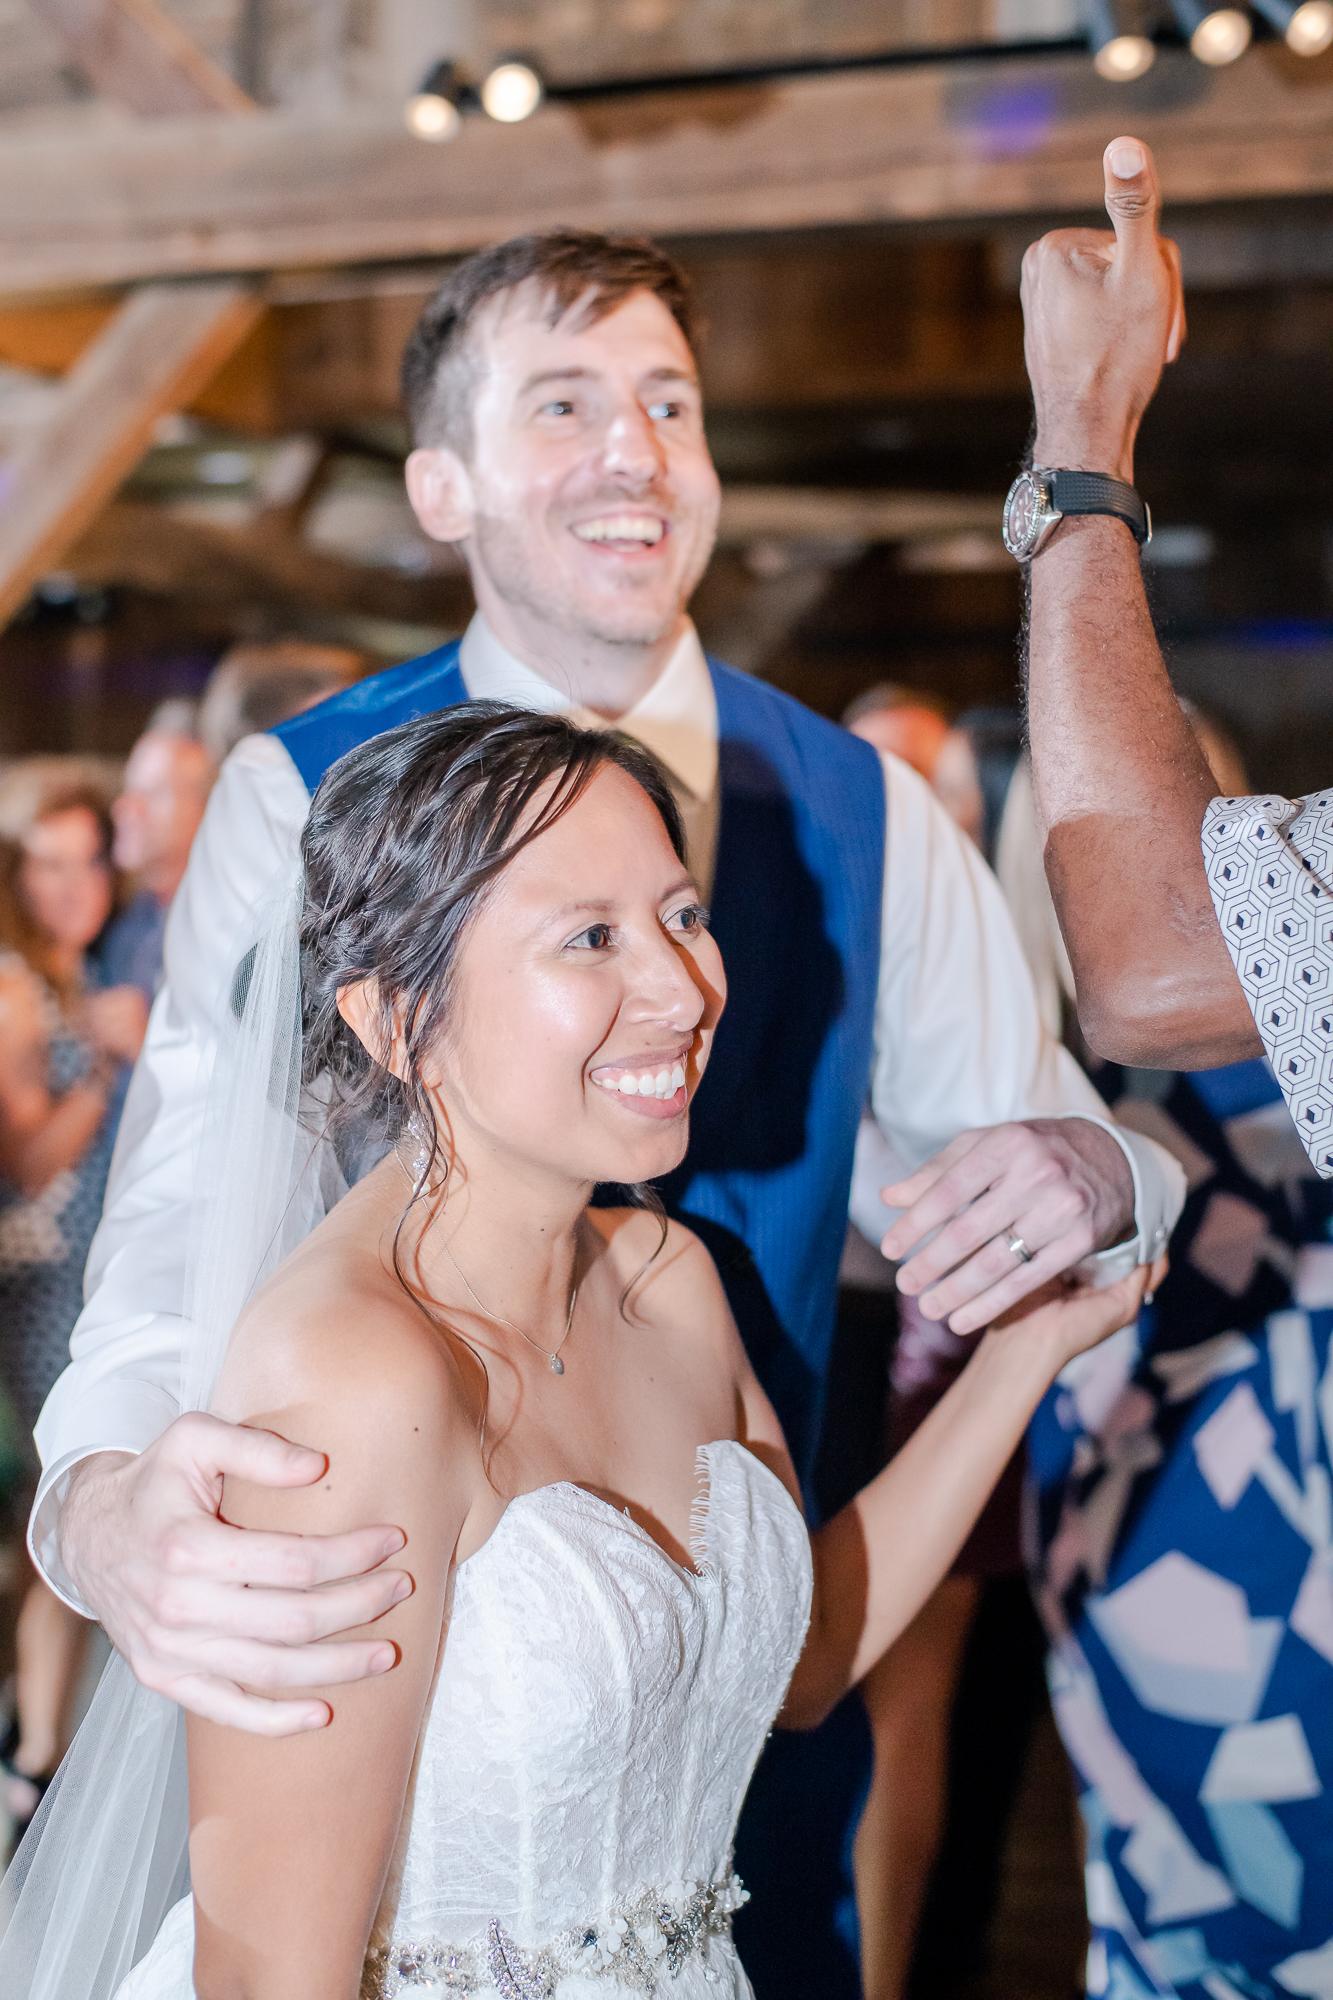 Maria+Adam_Summer Barn Wedding_The Barn at The North Star Preserve_Oberlin_Ohio-221.jpg